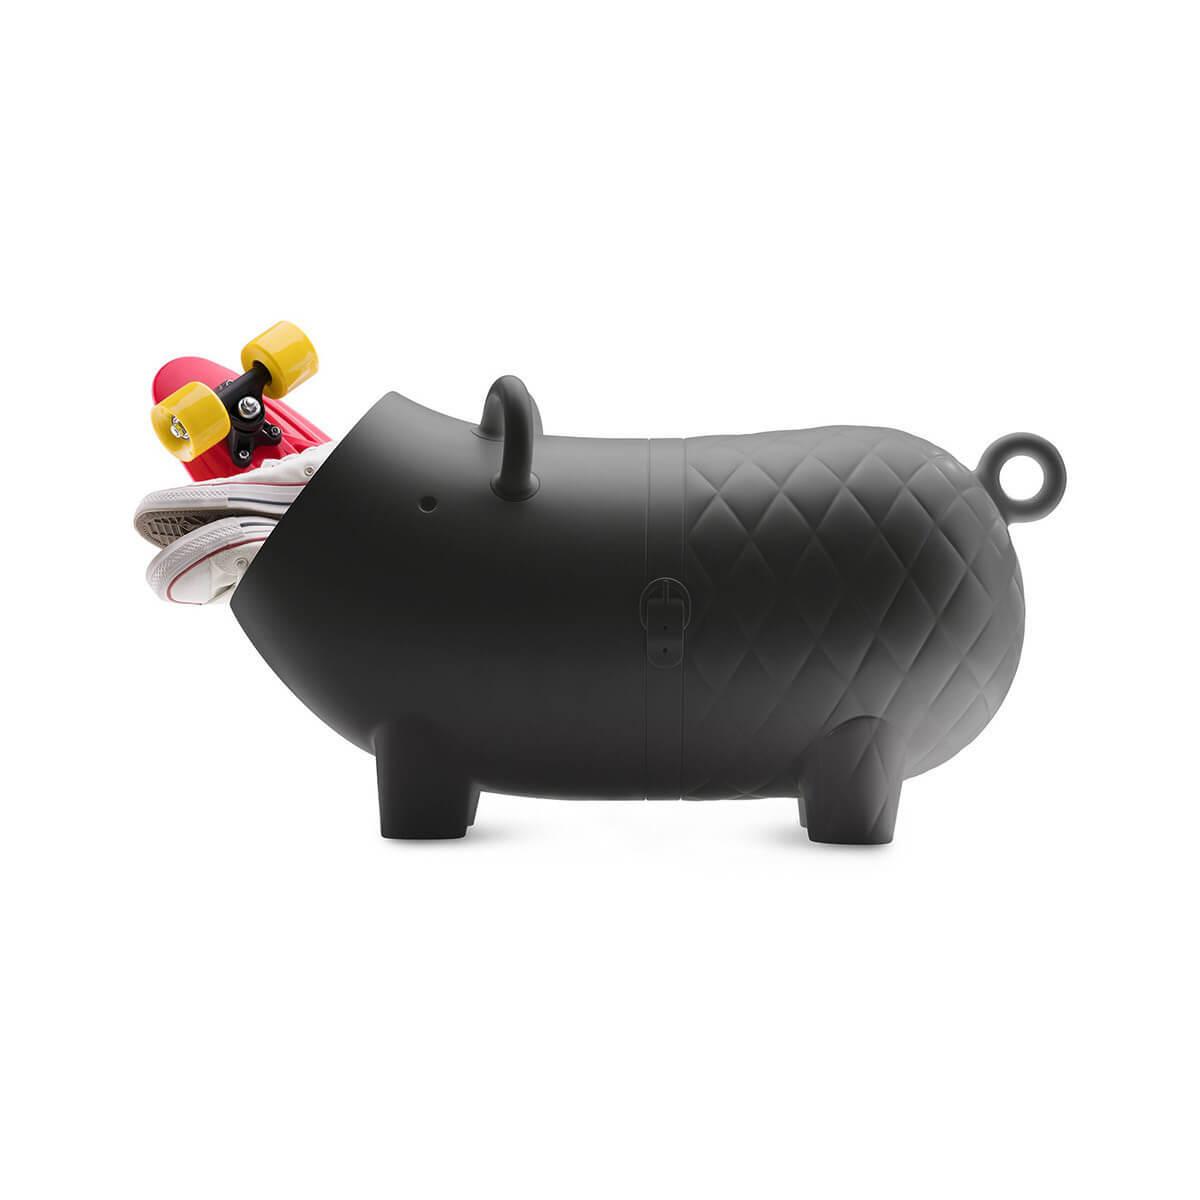 Cybex Wanders Hausschwein Свинка для хранения игрушек Cybex Wanders Hausschwein Black 10029_6-Hausschwein-black.jpg